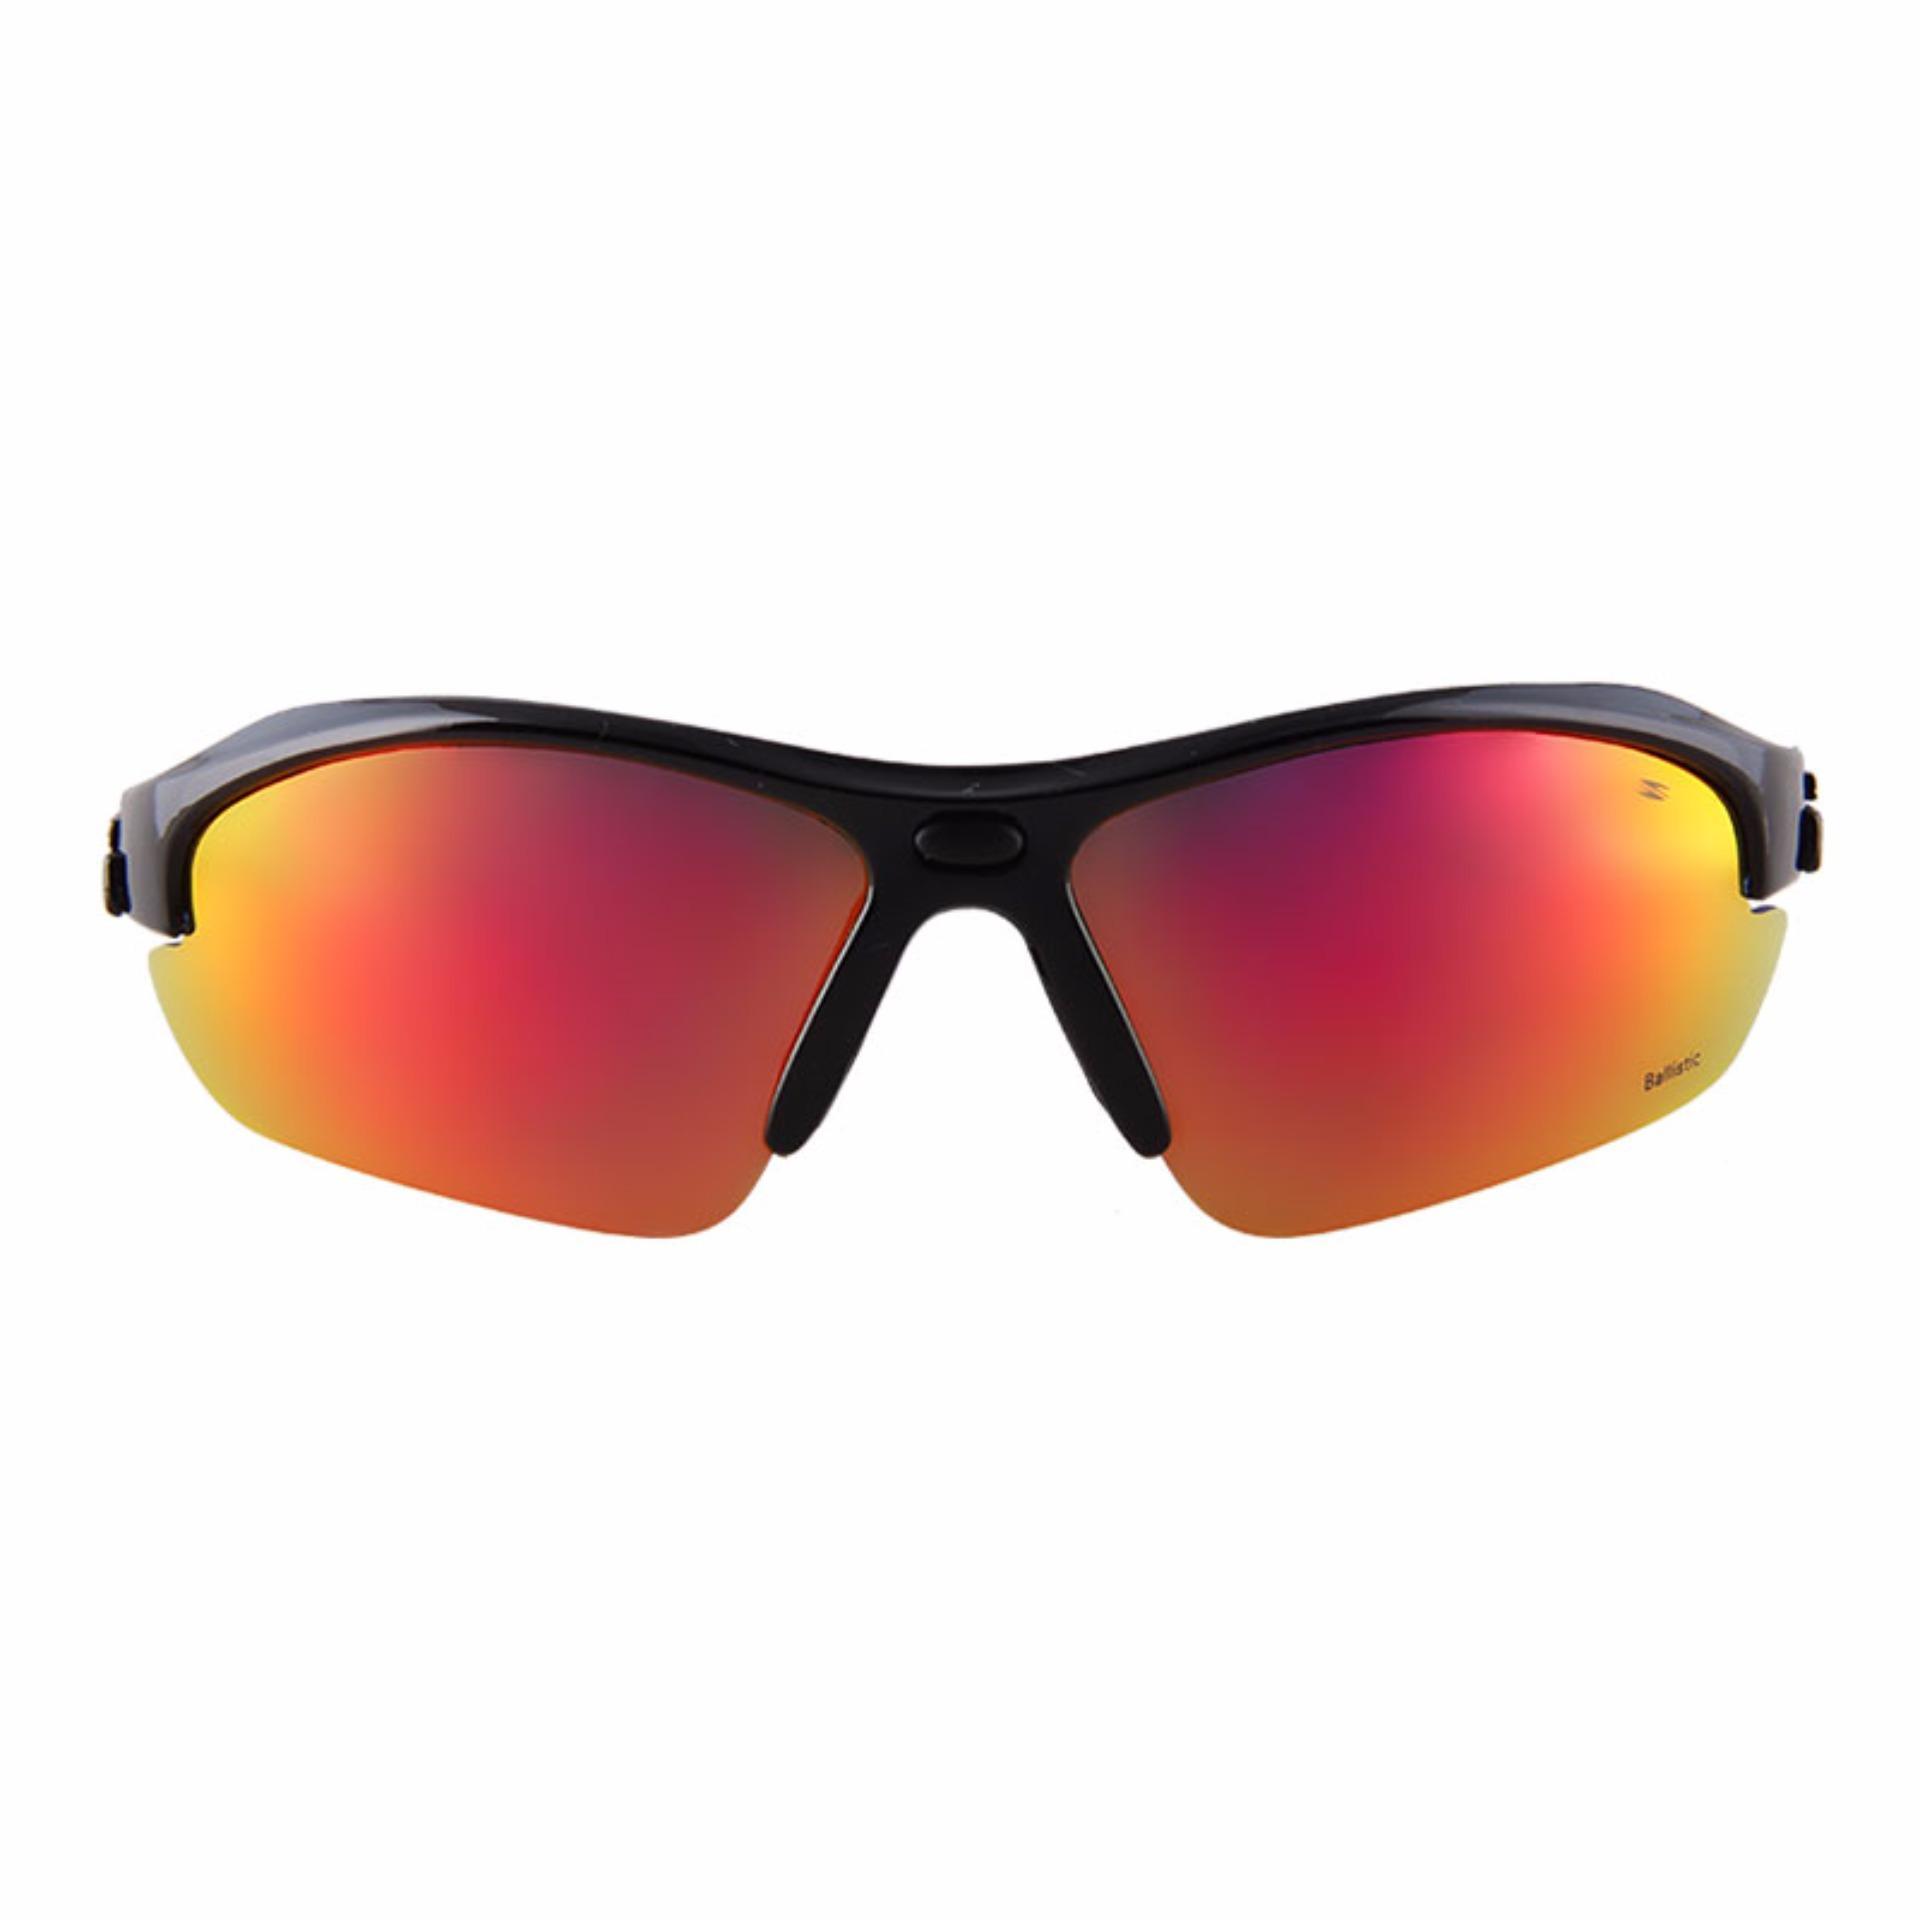 9e2b2107c5 Spyder Philippines -Spyder Sunglasses For Men for sale - prices ...